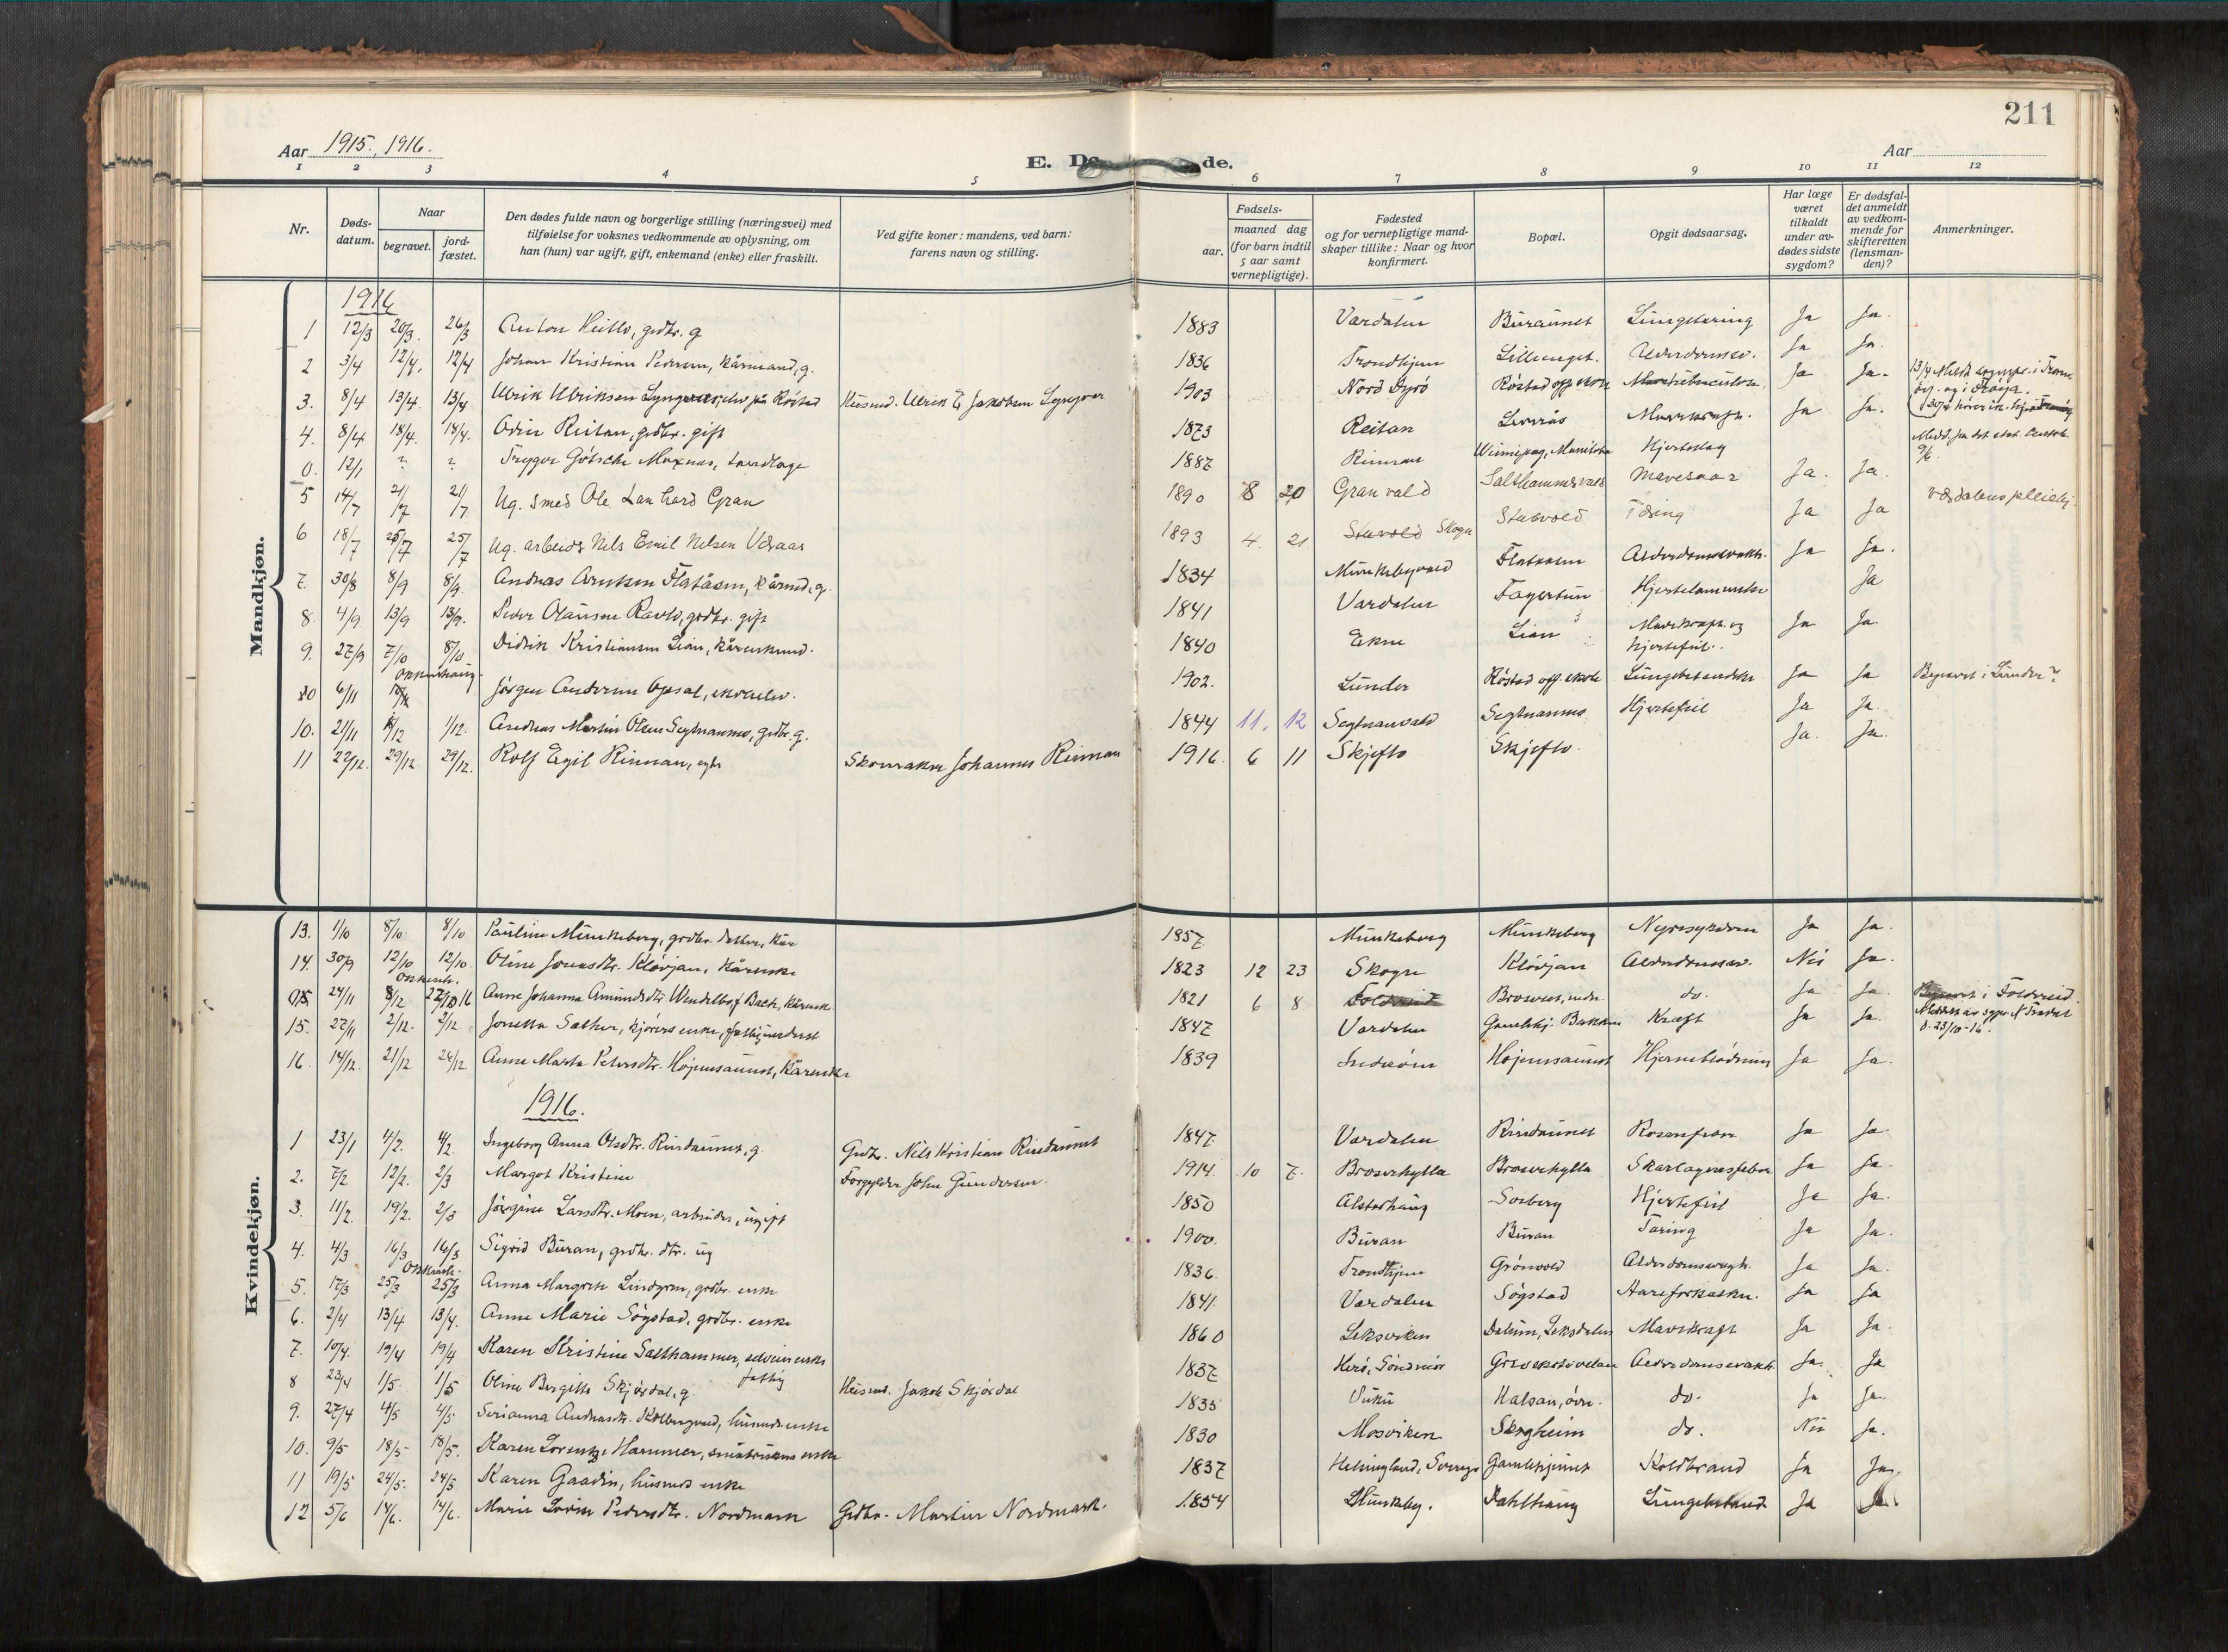 SAT, Levanger sokneprestkontor*, Parish register (official) no. 1, 1912-1935, p. 211